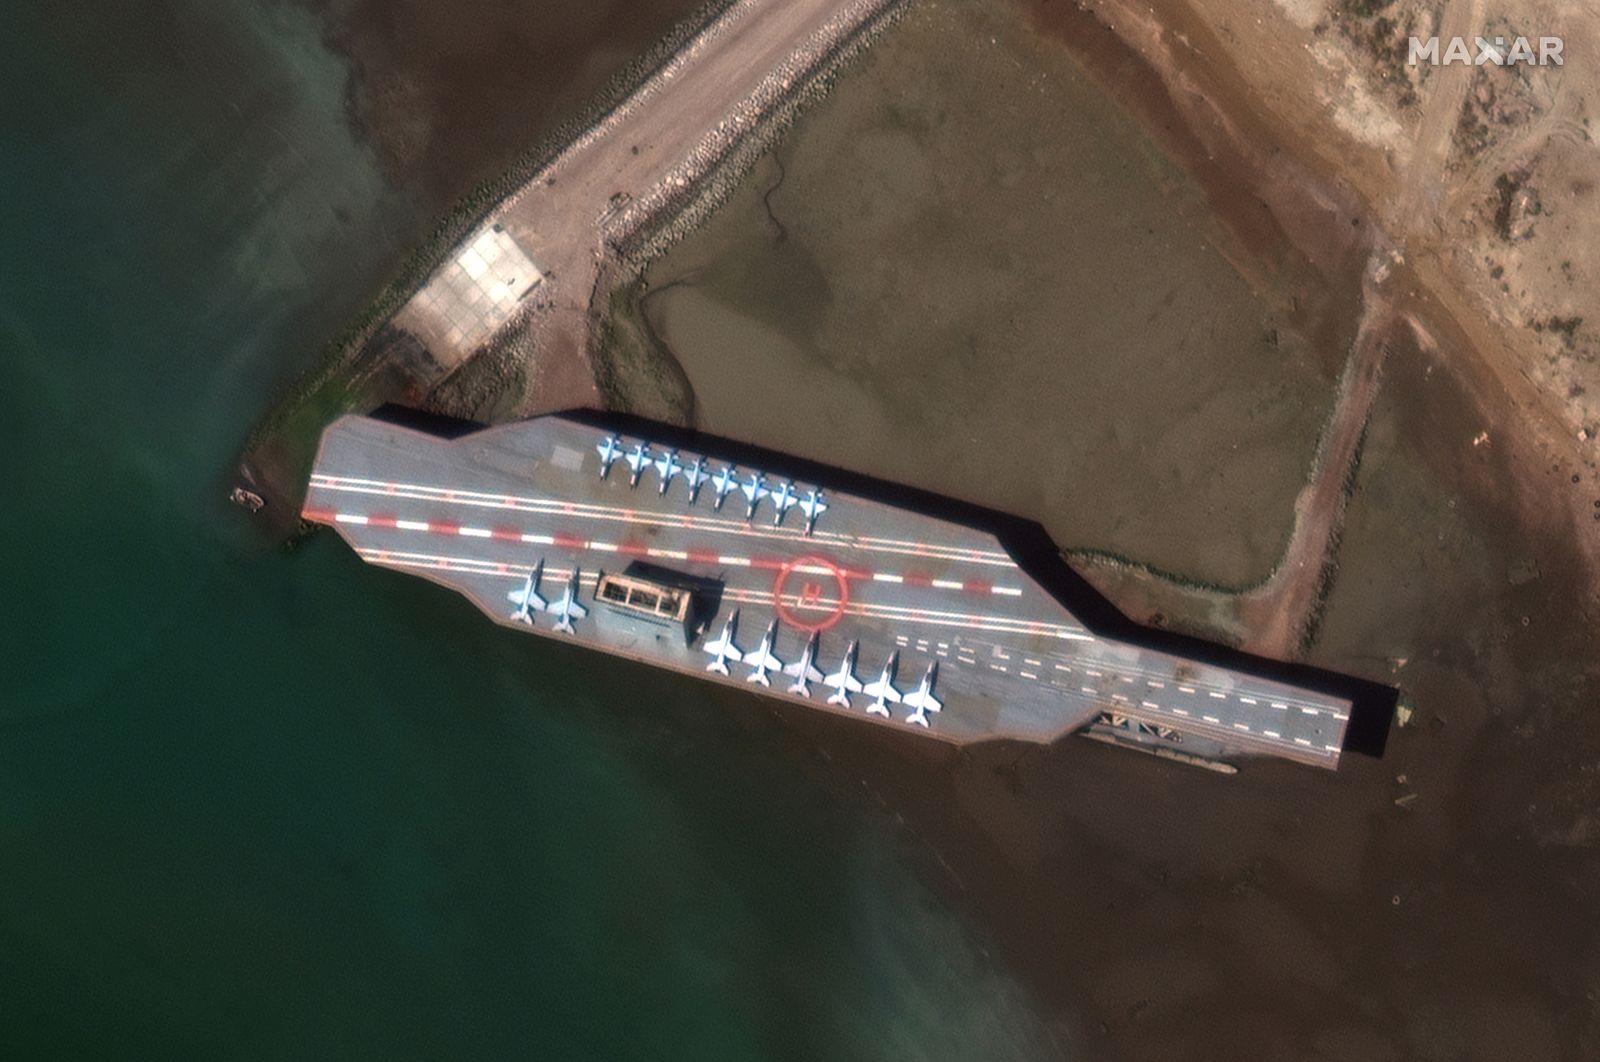 Iran's refurbished mockup aircraft carrier is seen at its home port of Bandar Abbas